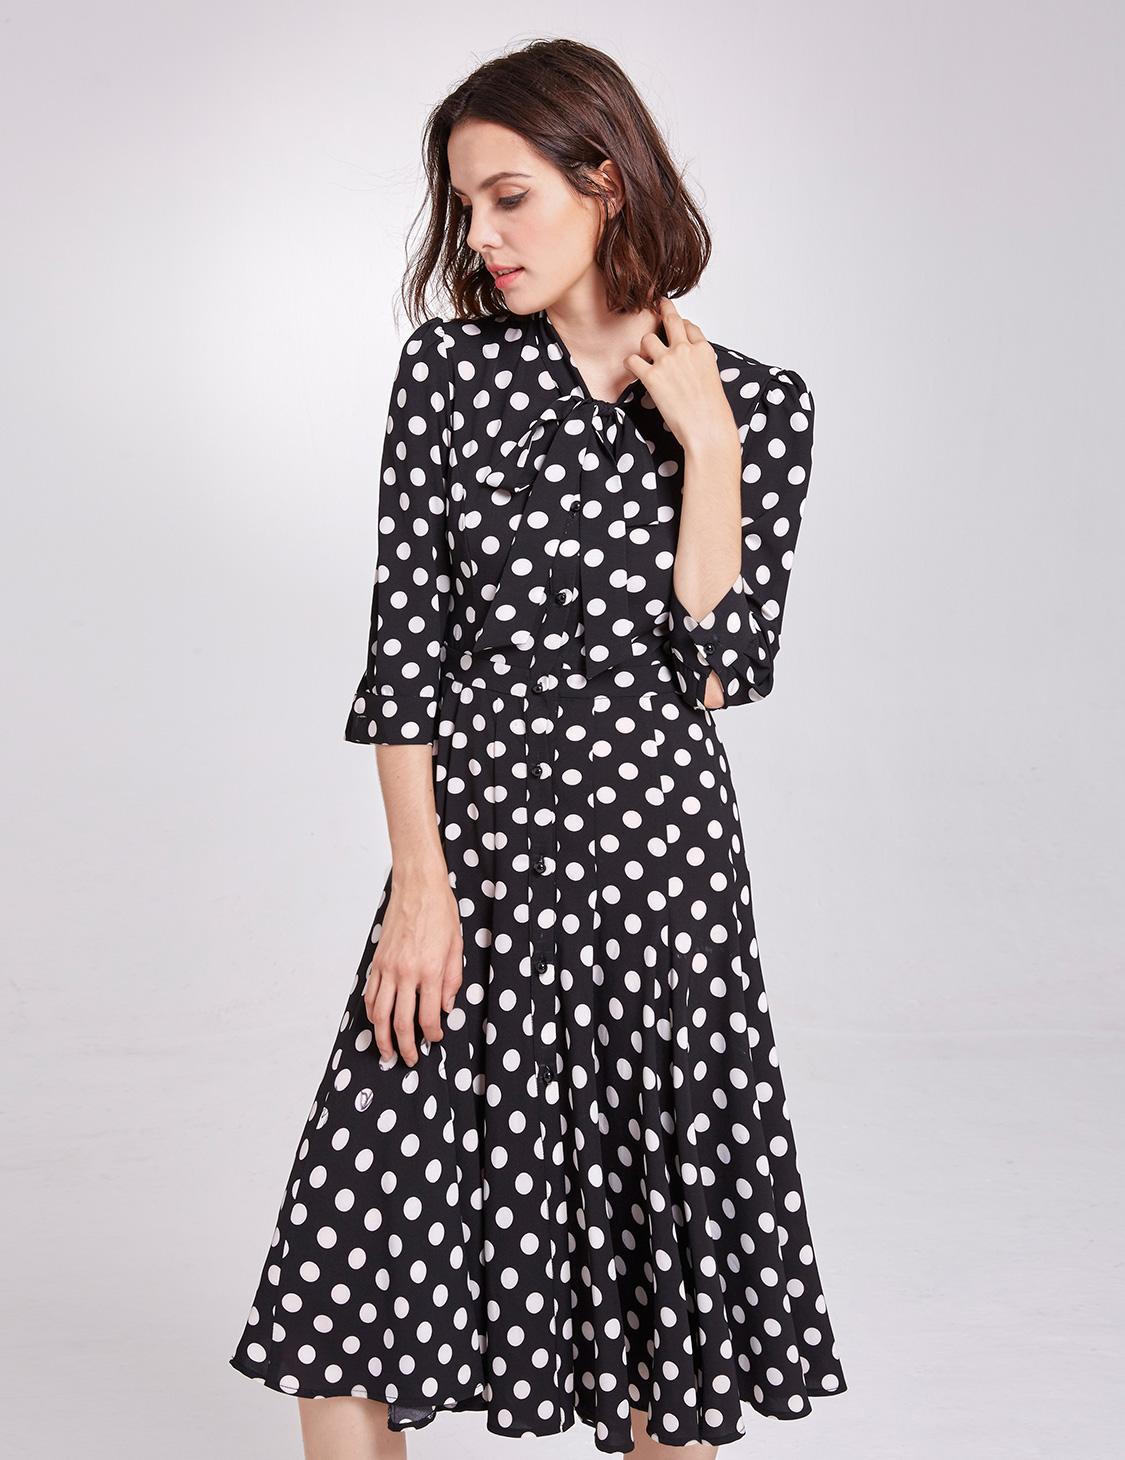 Alisa-Pan-Vintage-Cocktail-Dress-Polka-Dot-Elbow-Sleeve-Casual-Party-Dress-05930